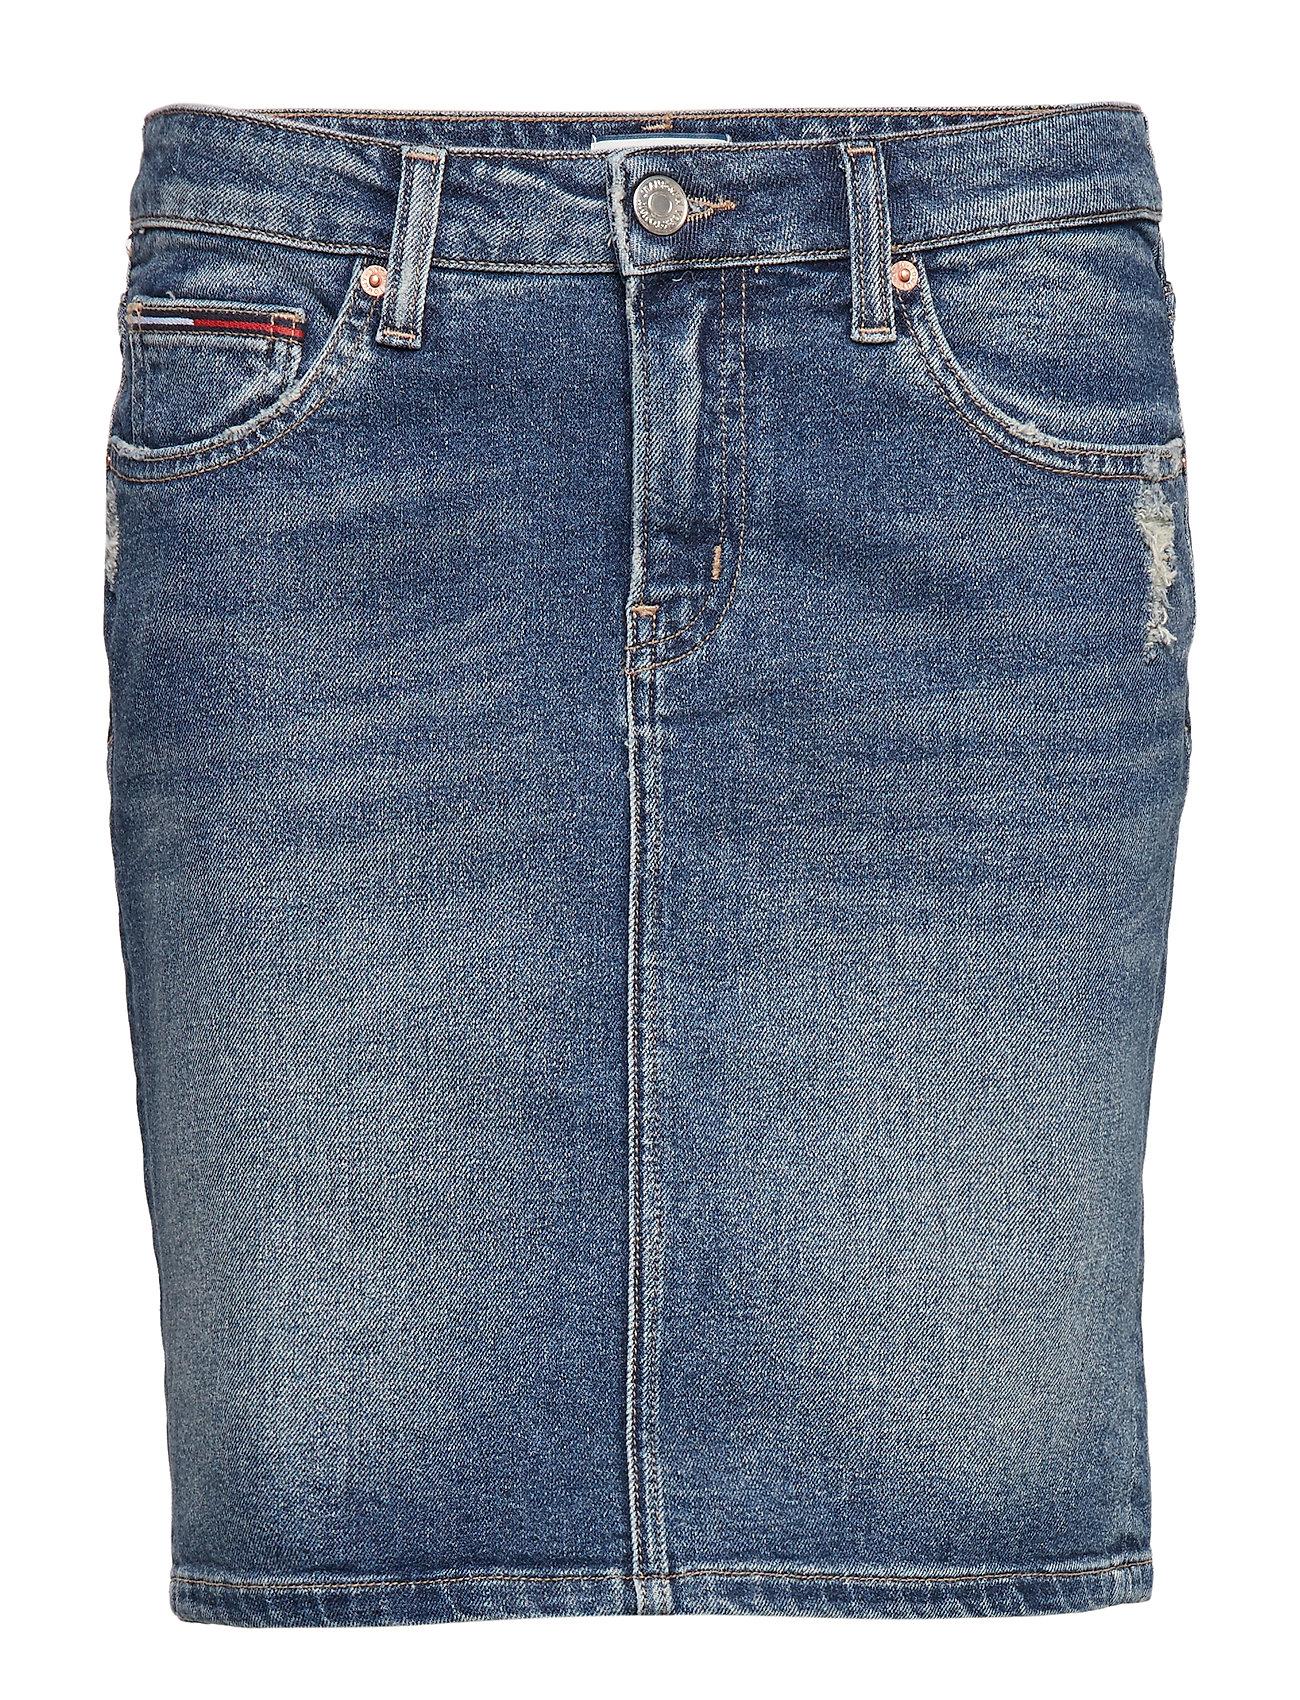 Tommy Jeans REGULAR DENIM SKIRT, - CALI MID BL COM